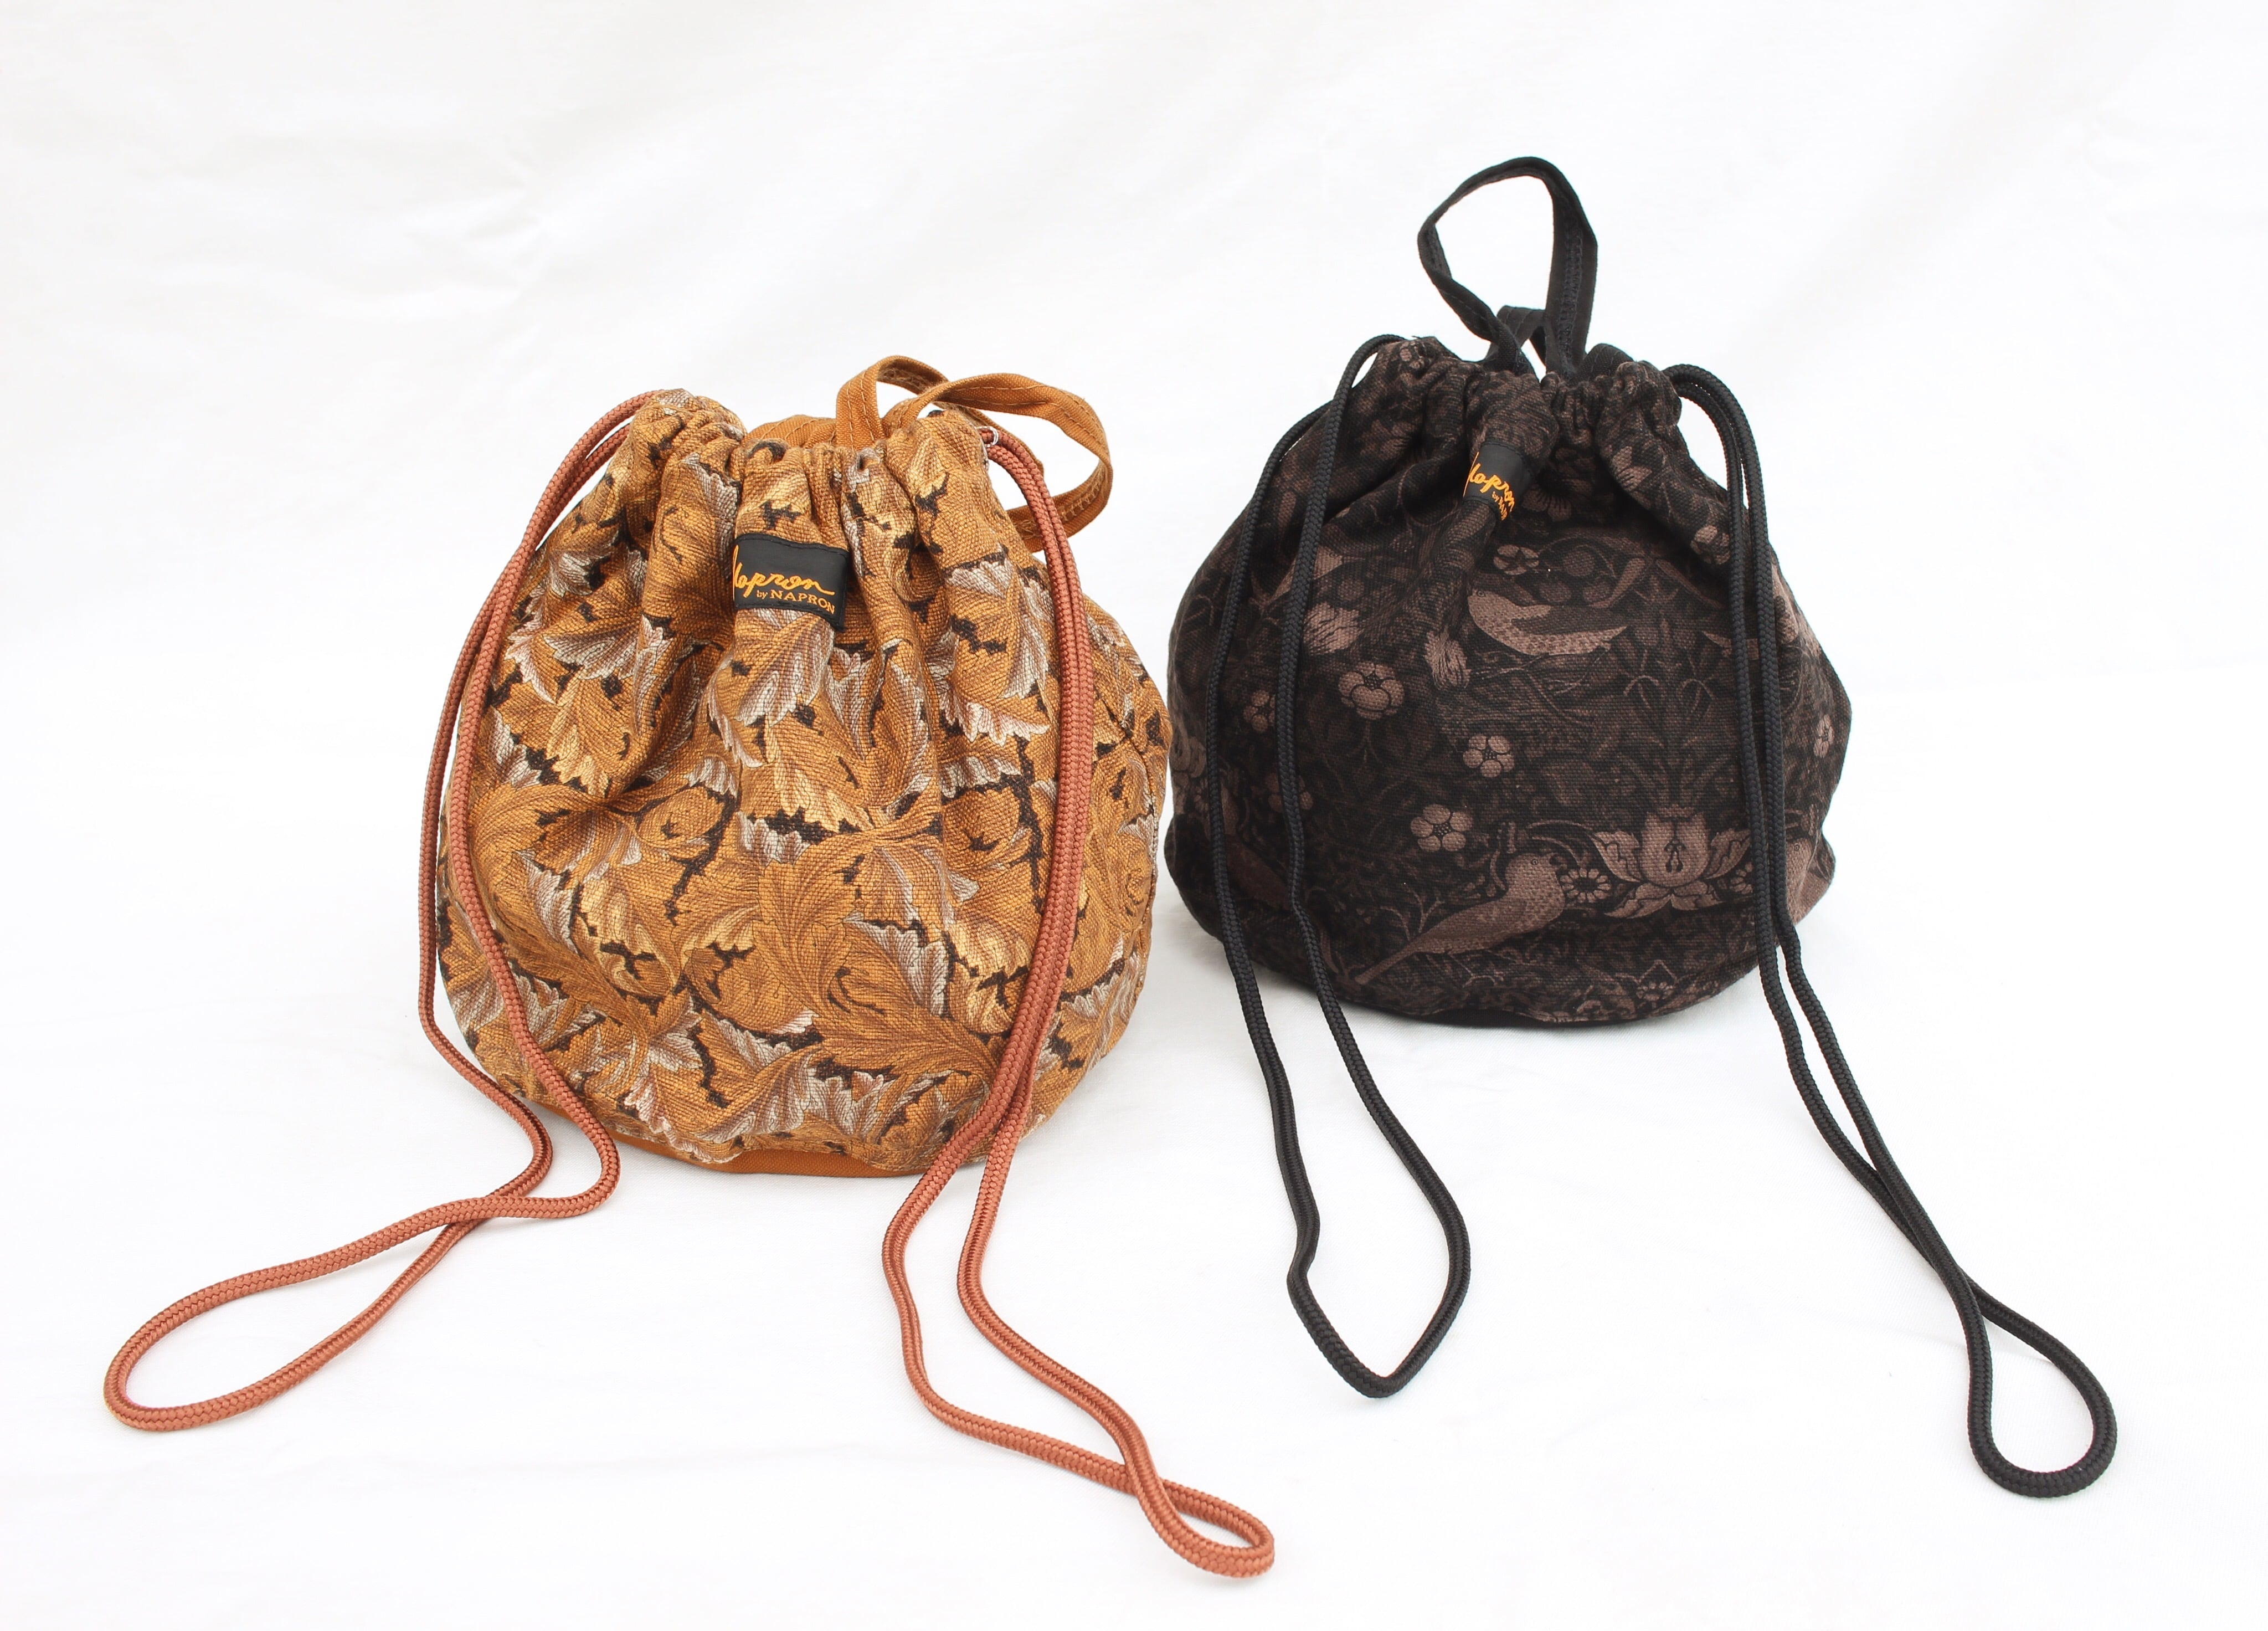 NAPRON(ナプロン)/ Patients Bag(ペイシェントバッグ)